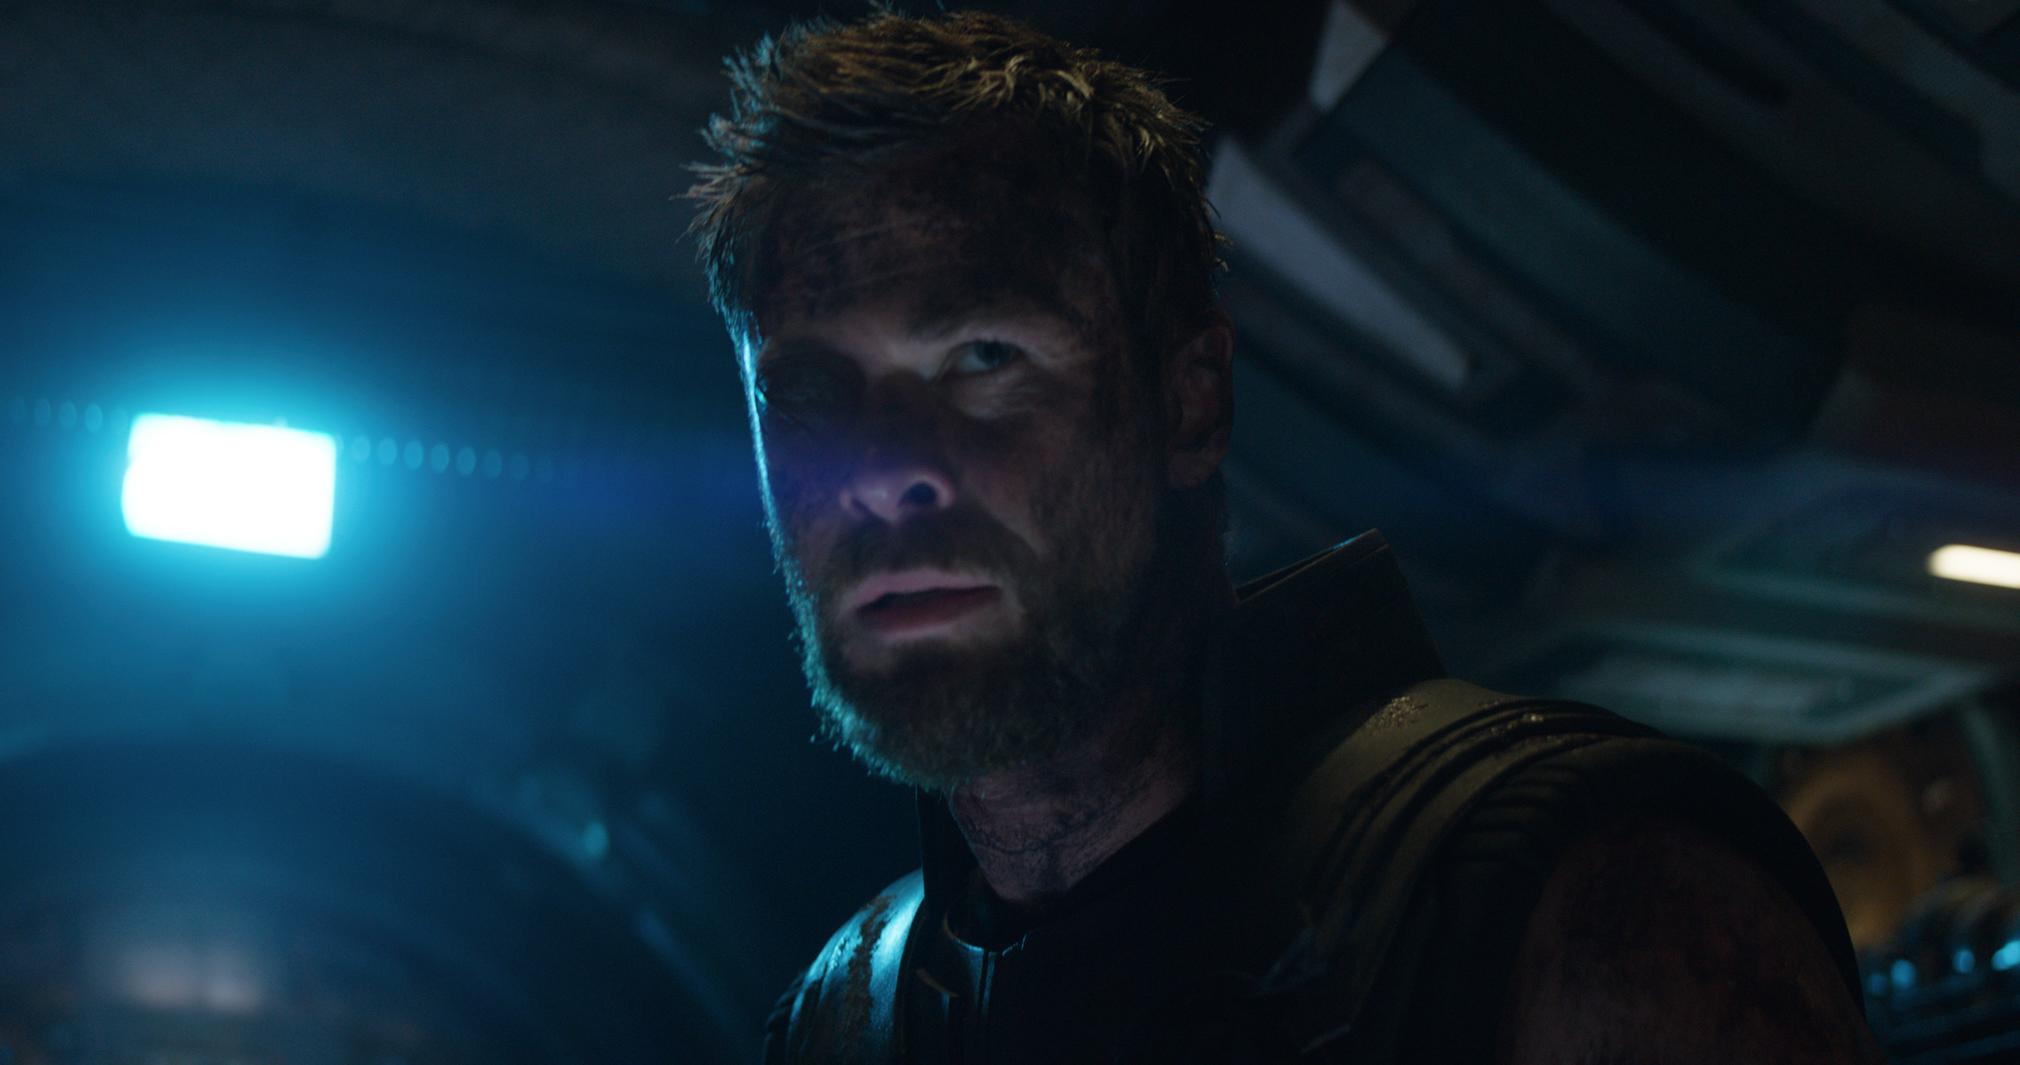 avengers infinity war image thor - Avengers: Infinity War - La Reseña Cinergetica (Spoilers) y Análisis